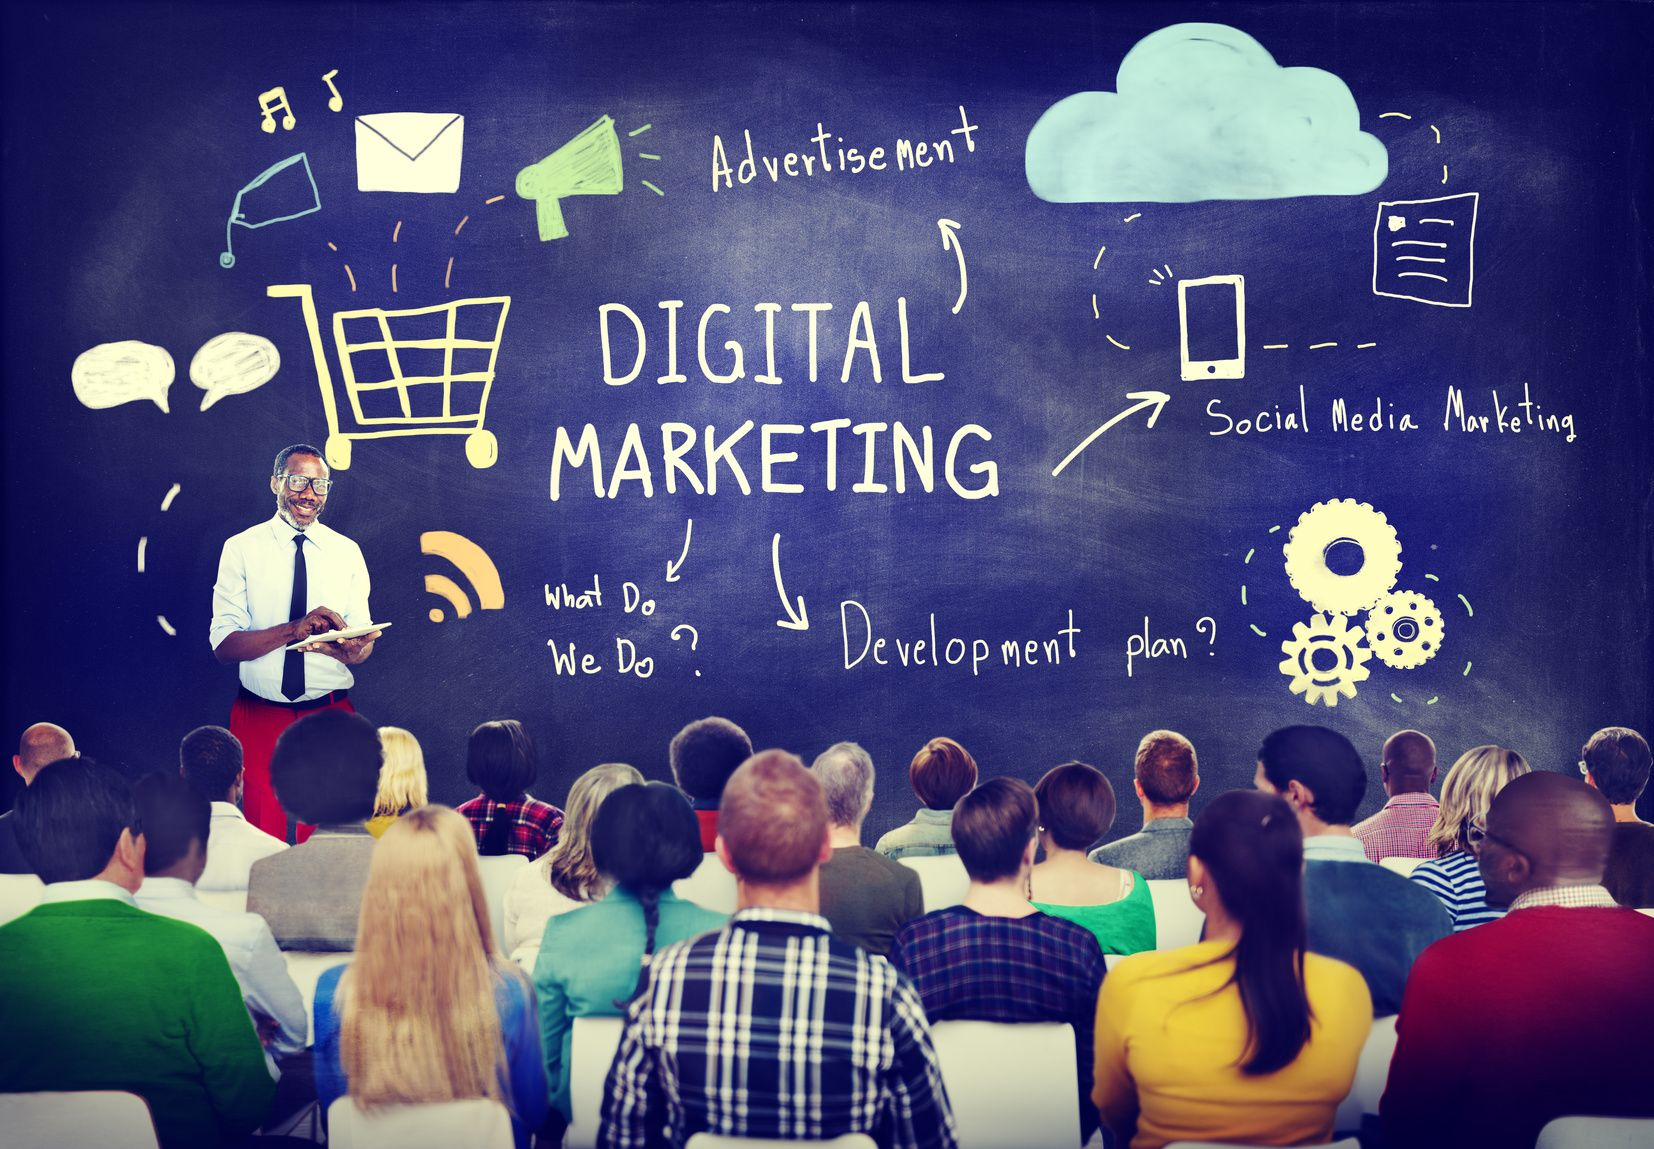 Digital Marketing Training In Ranchi Jharkhand In 2020 Digital Marketing Social Media Digital Marketing Marketing Courses